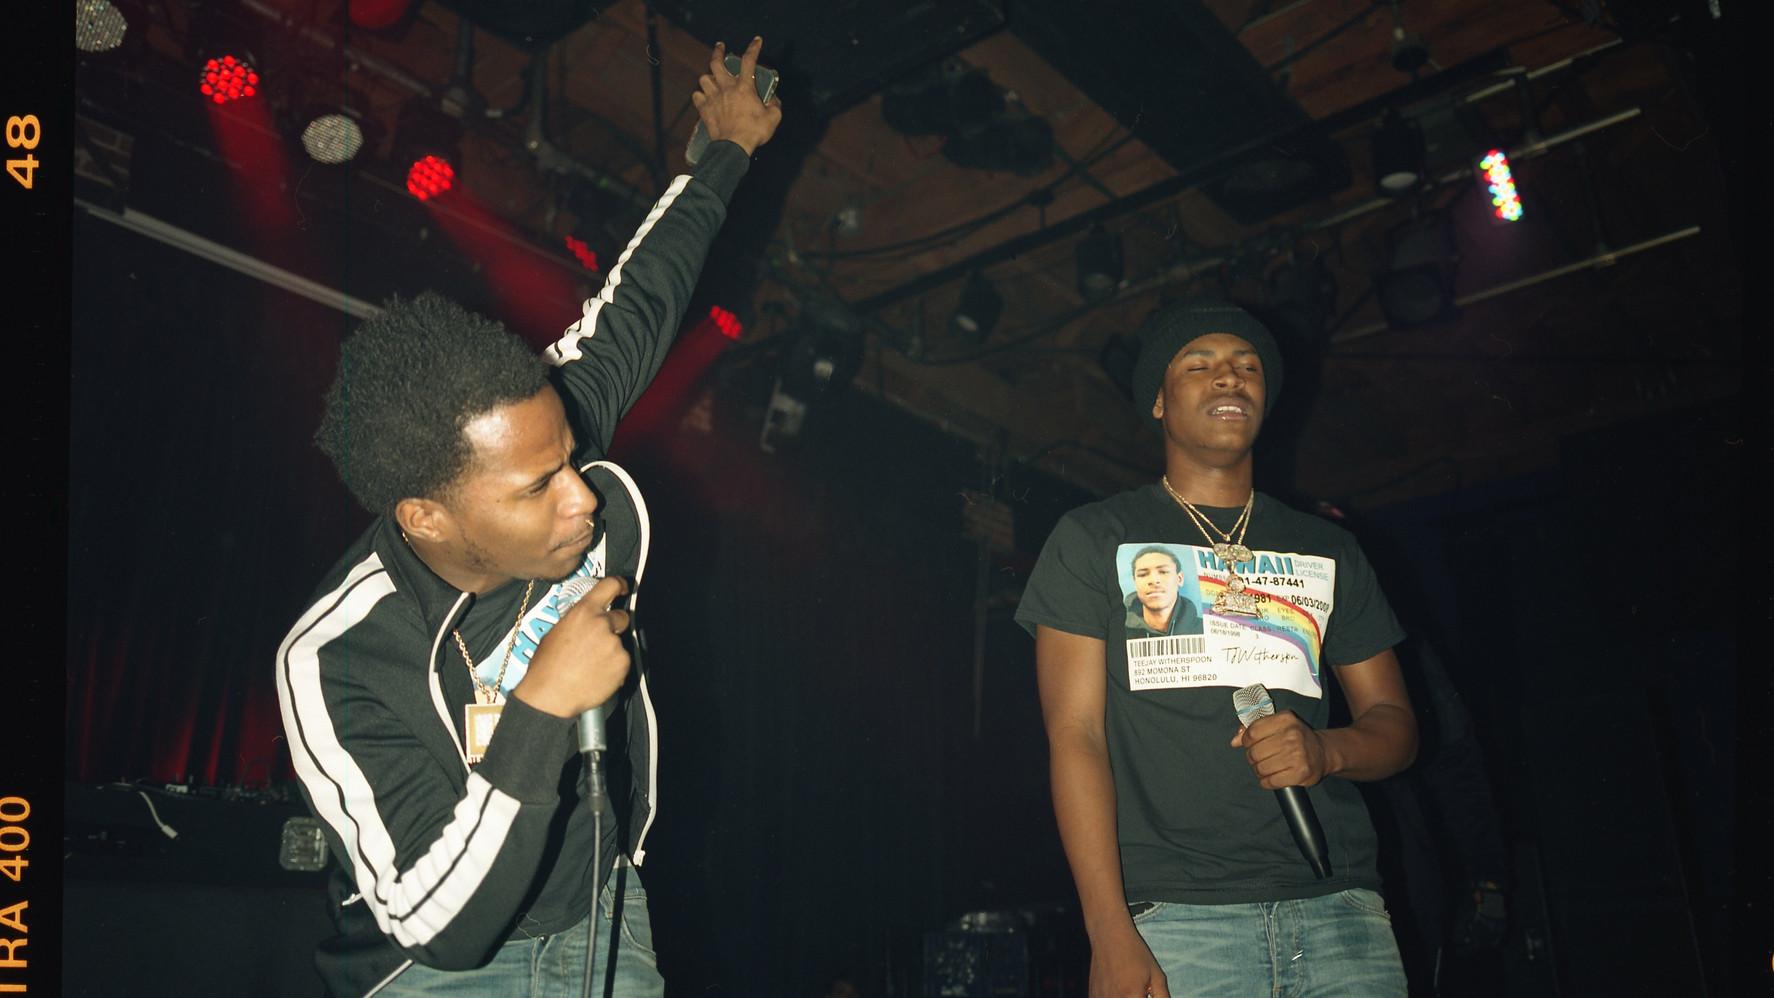 2.18.20 | Thouxanbanfauni & Teejayx6 | Slim's, SF, CA | Photographer: Maurqui Burks - Goldenvoice